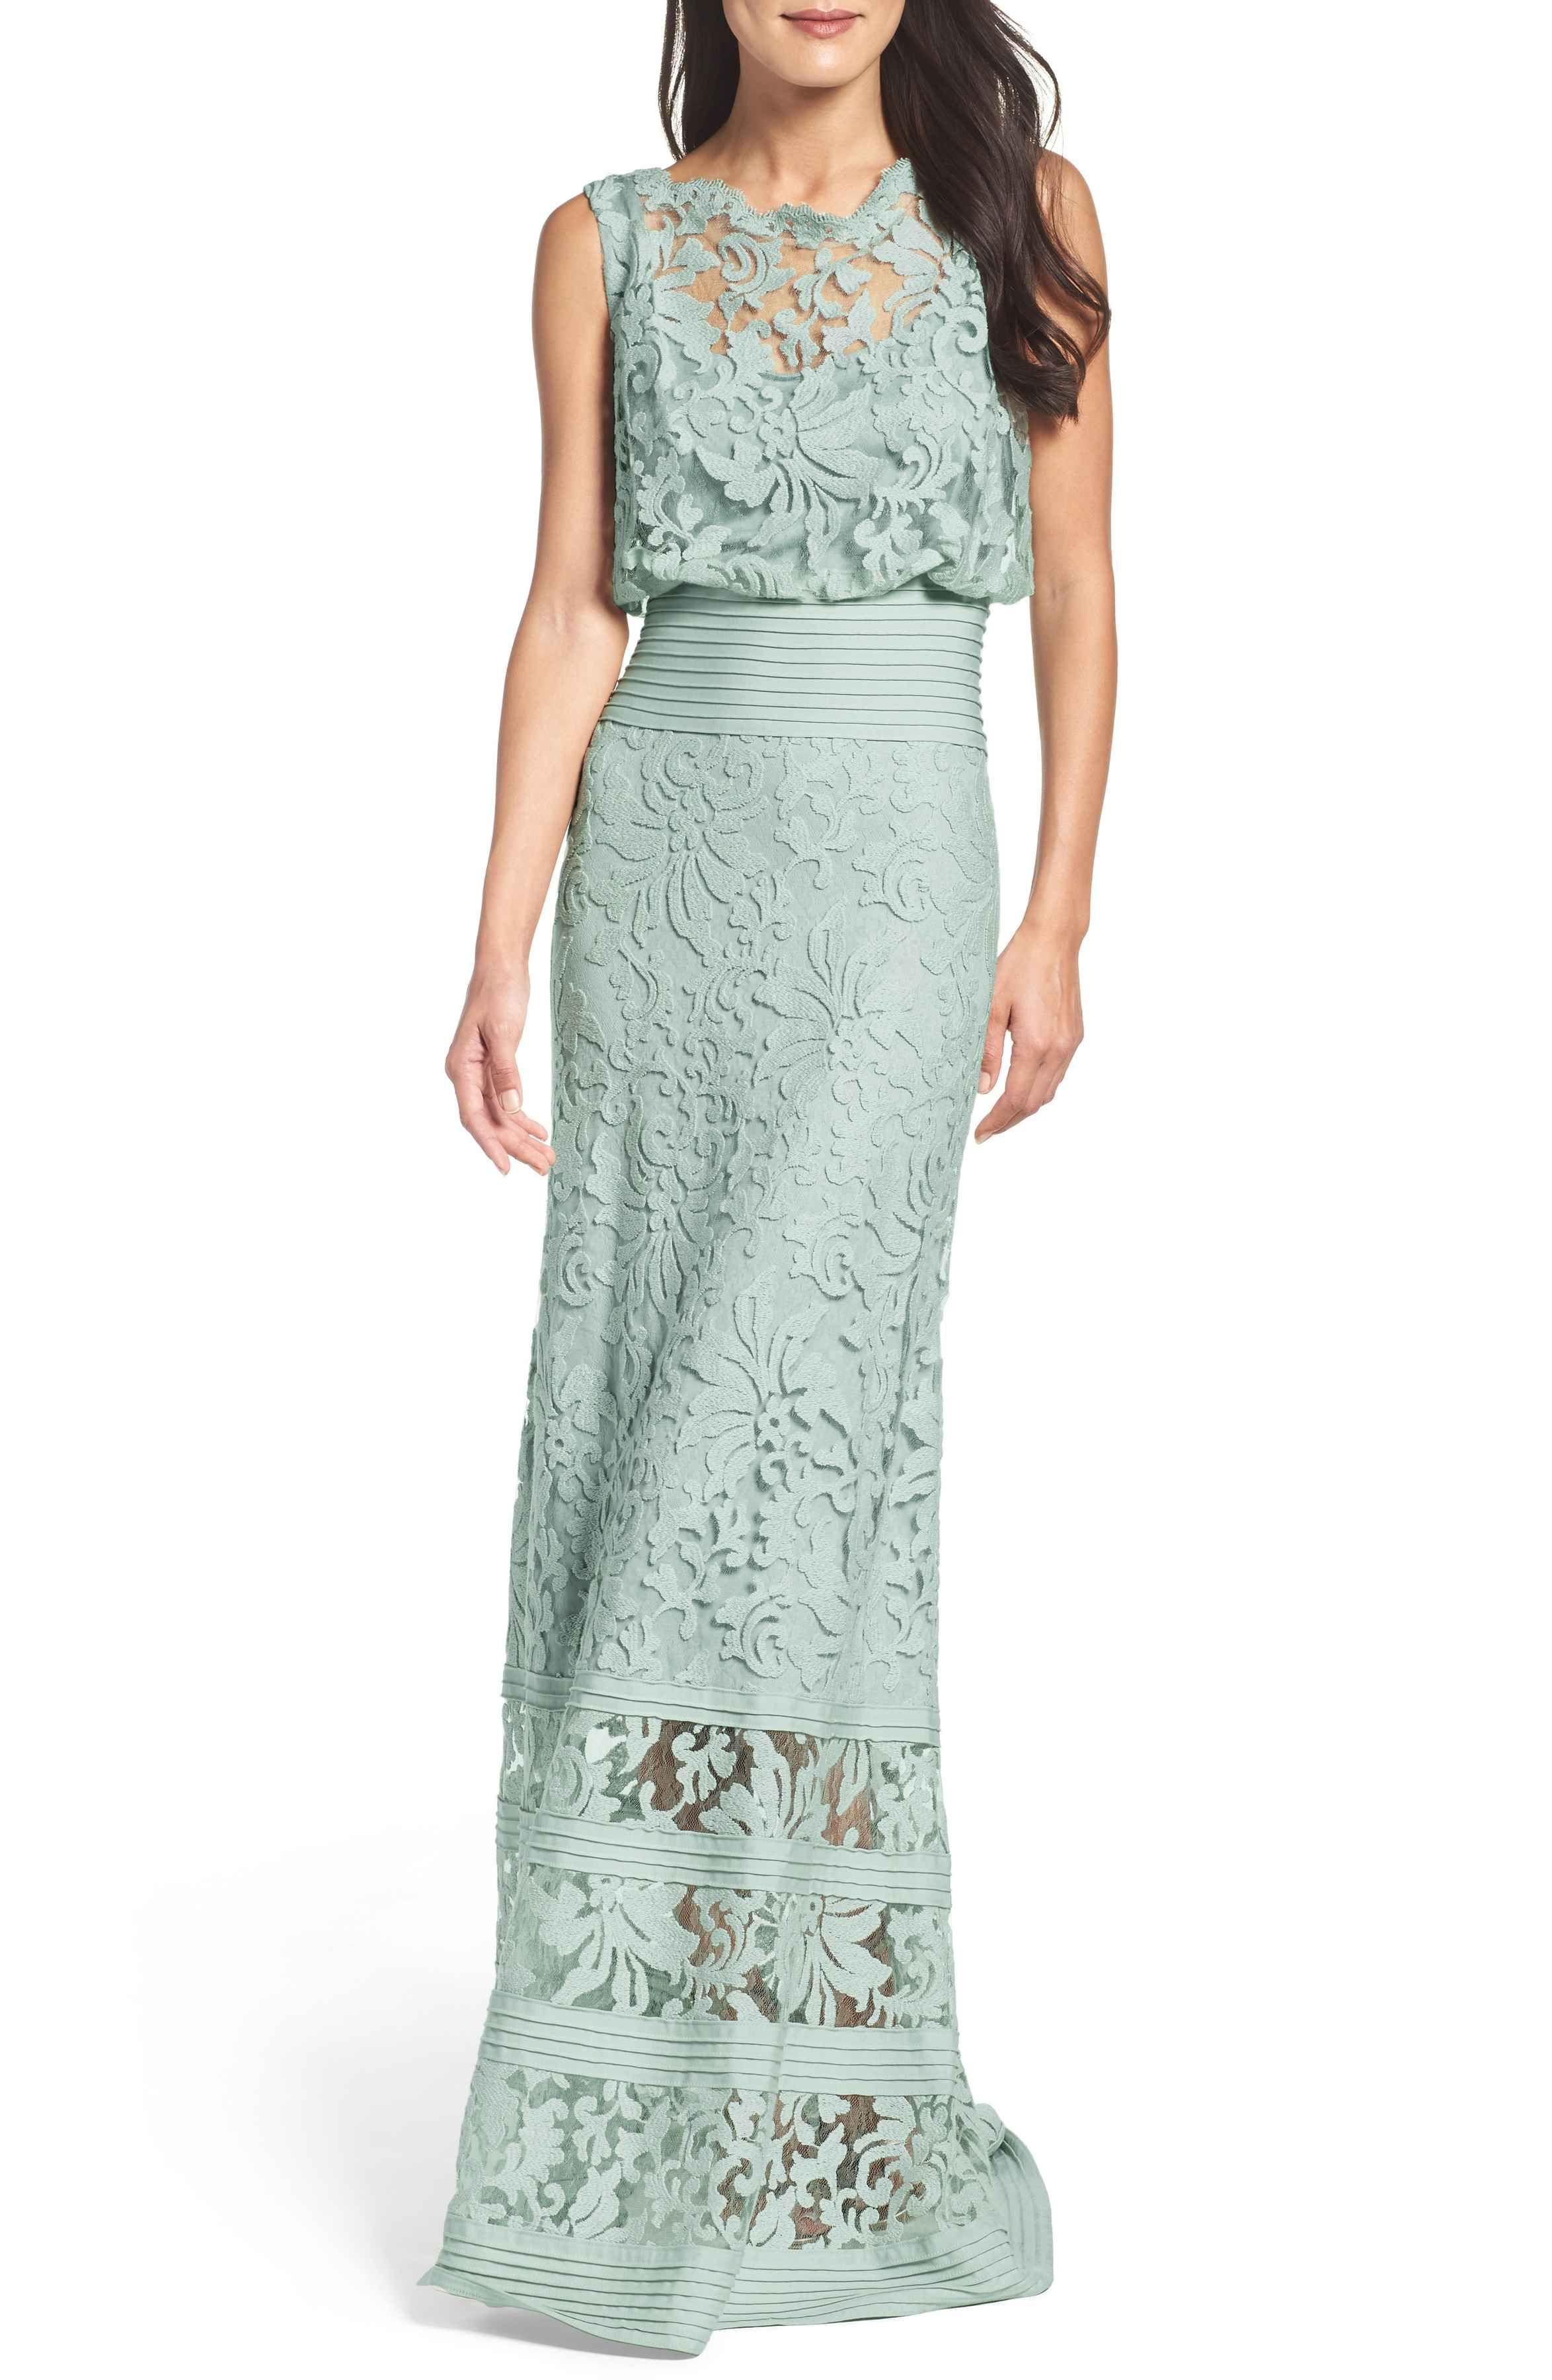 Main Image - Tadashi Shoji Blouson Gown | Lulla Wedding | For Mom ...